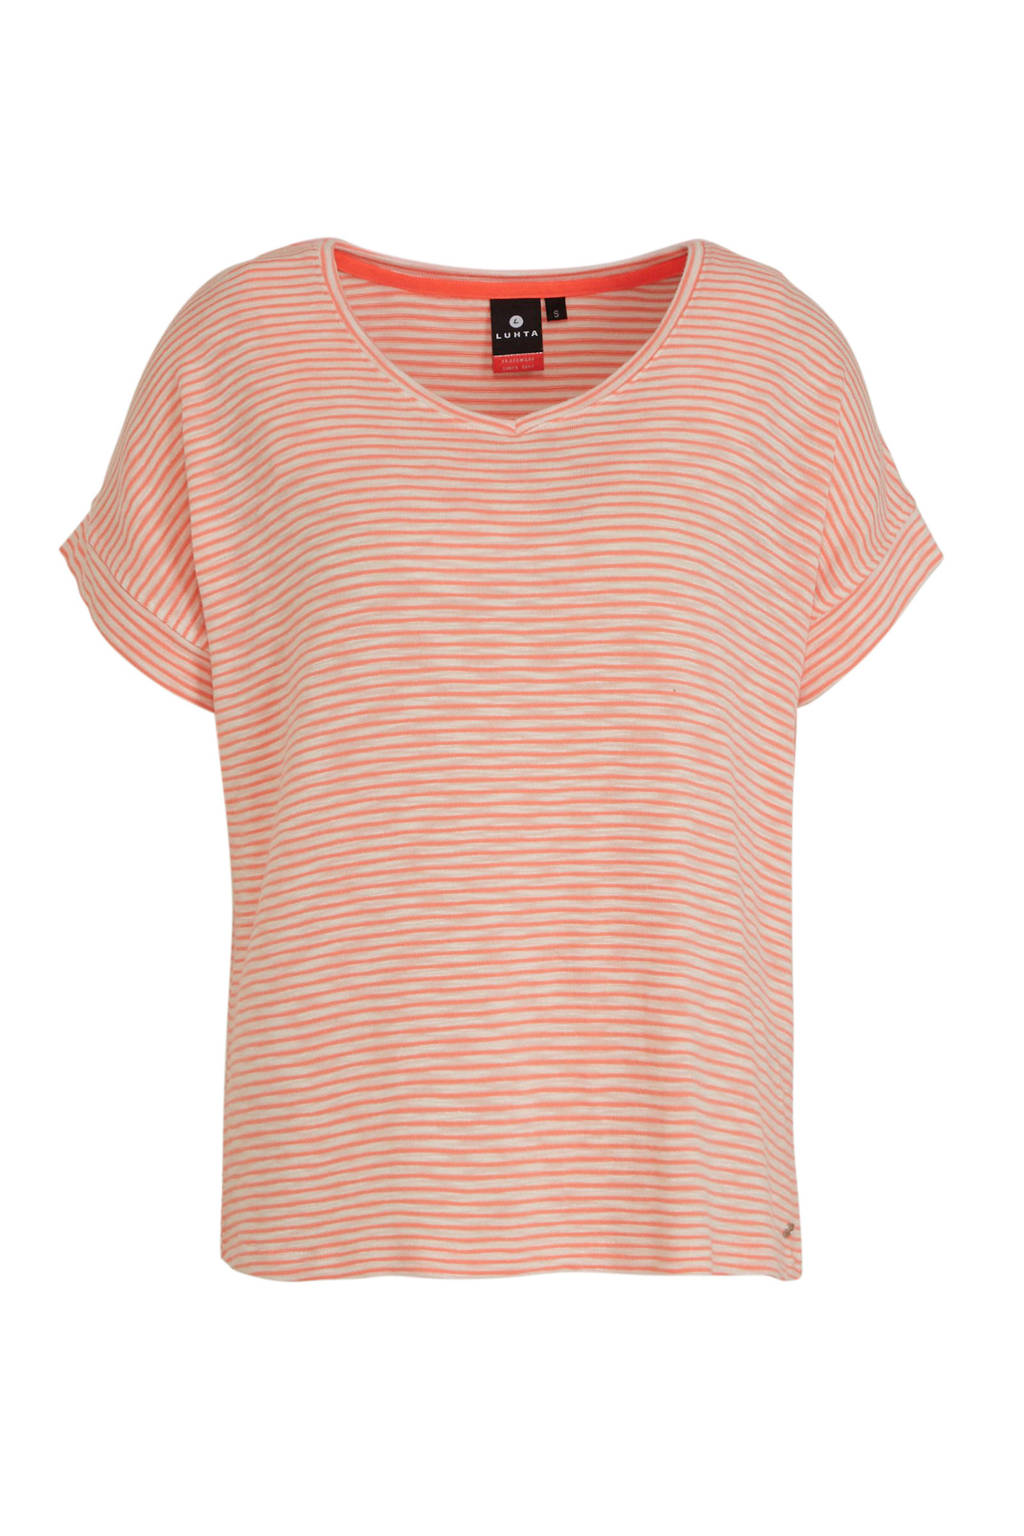 Luhta T-shirt Askala roze, Roze